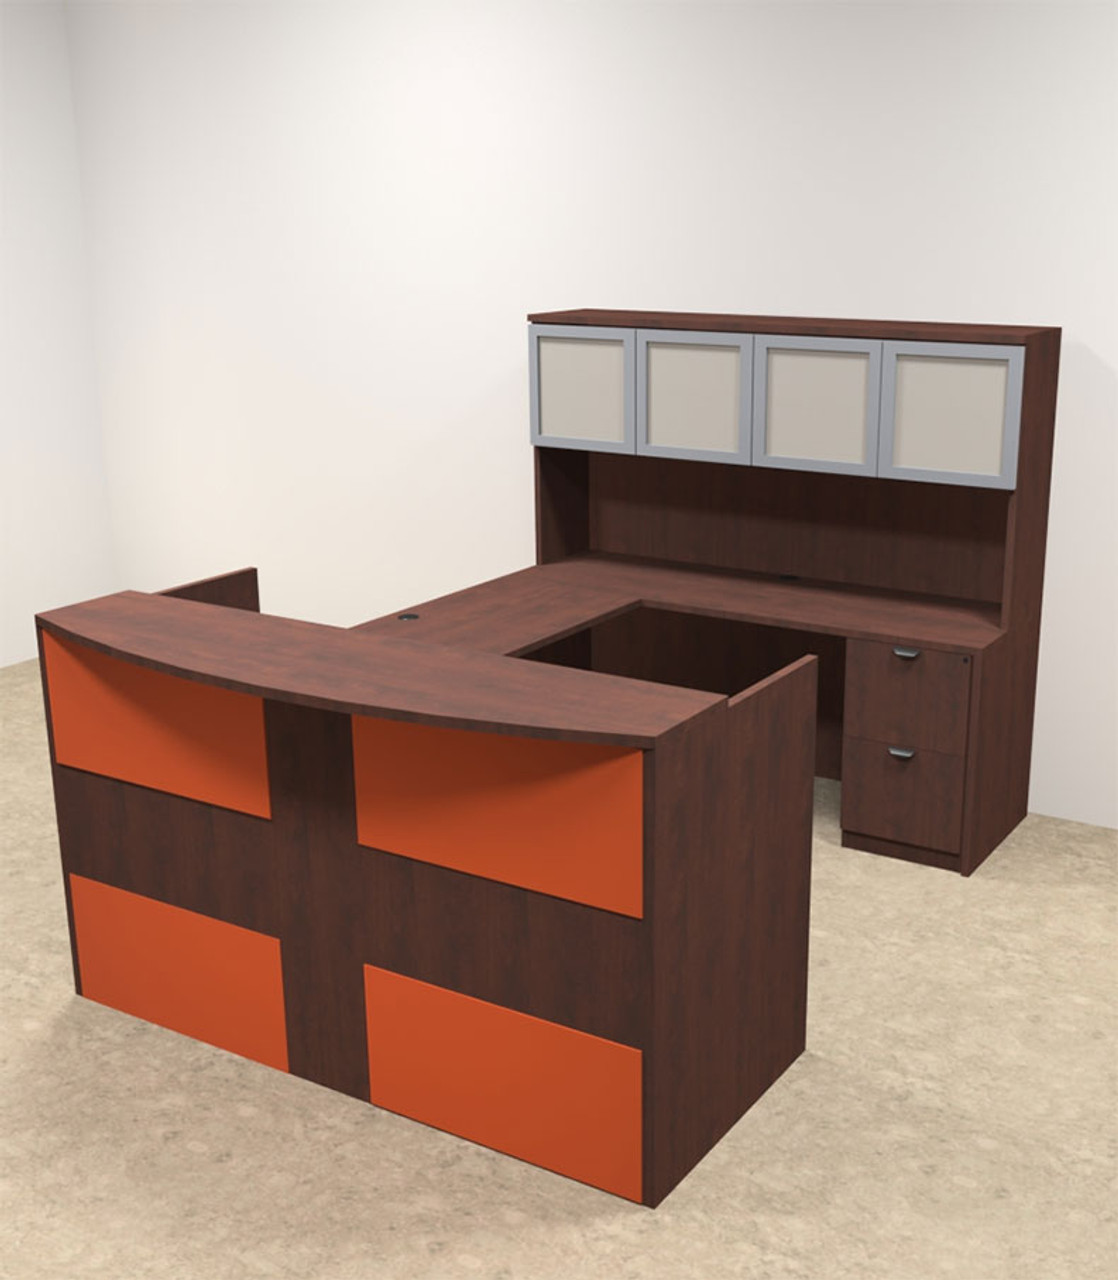 5pc U Shaped Modern Acrylic Panel Office Reception Desk, #OT-SUL-RO30